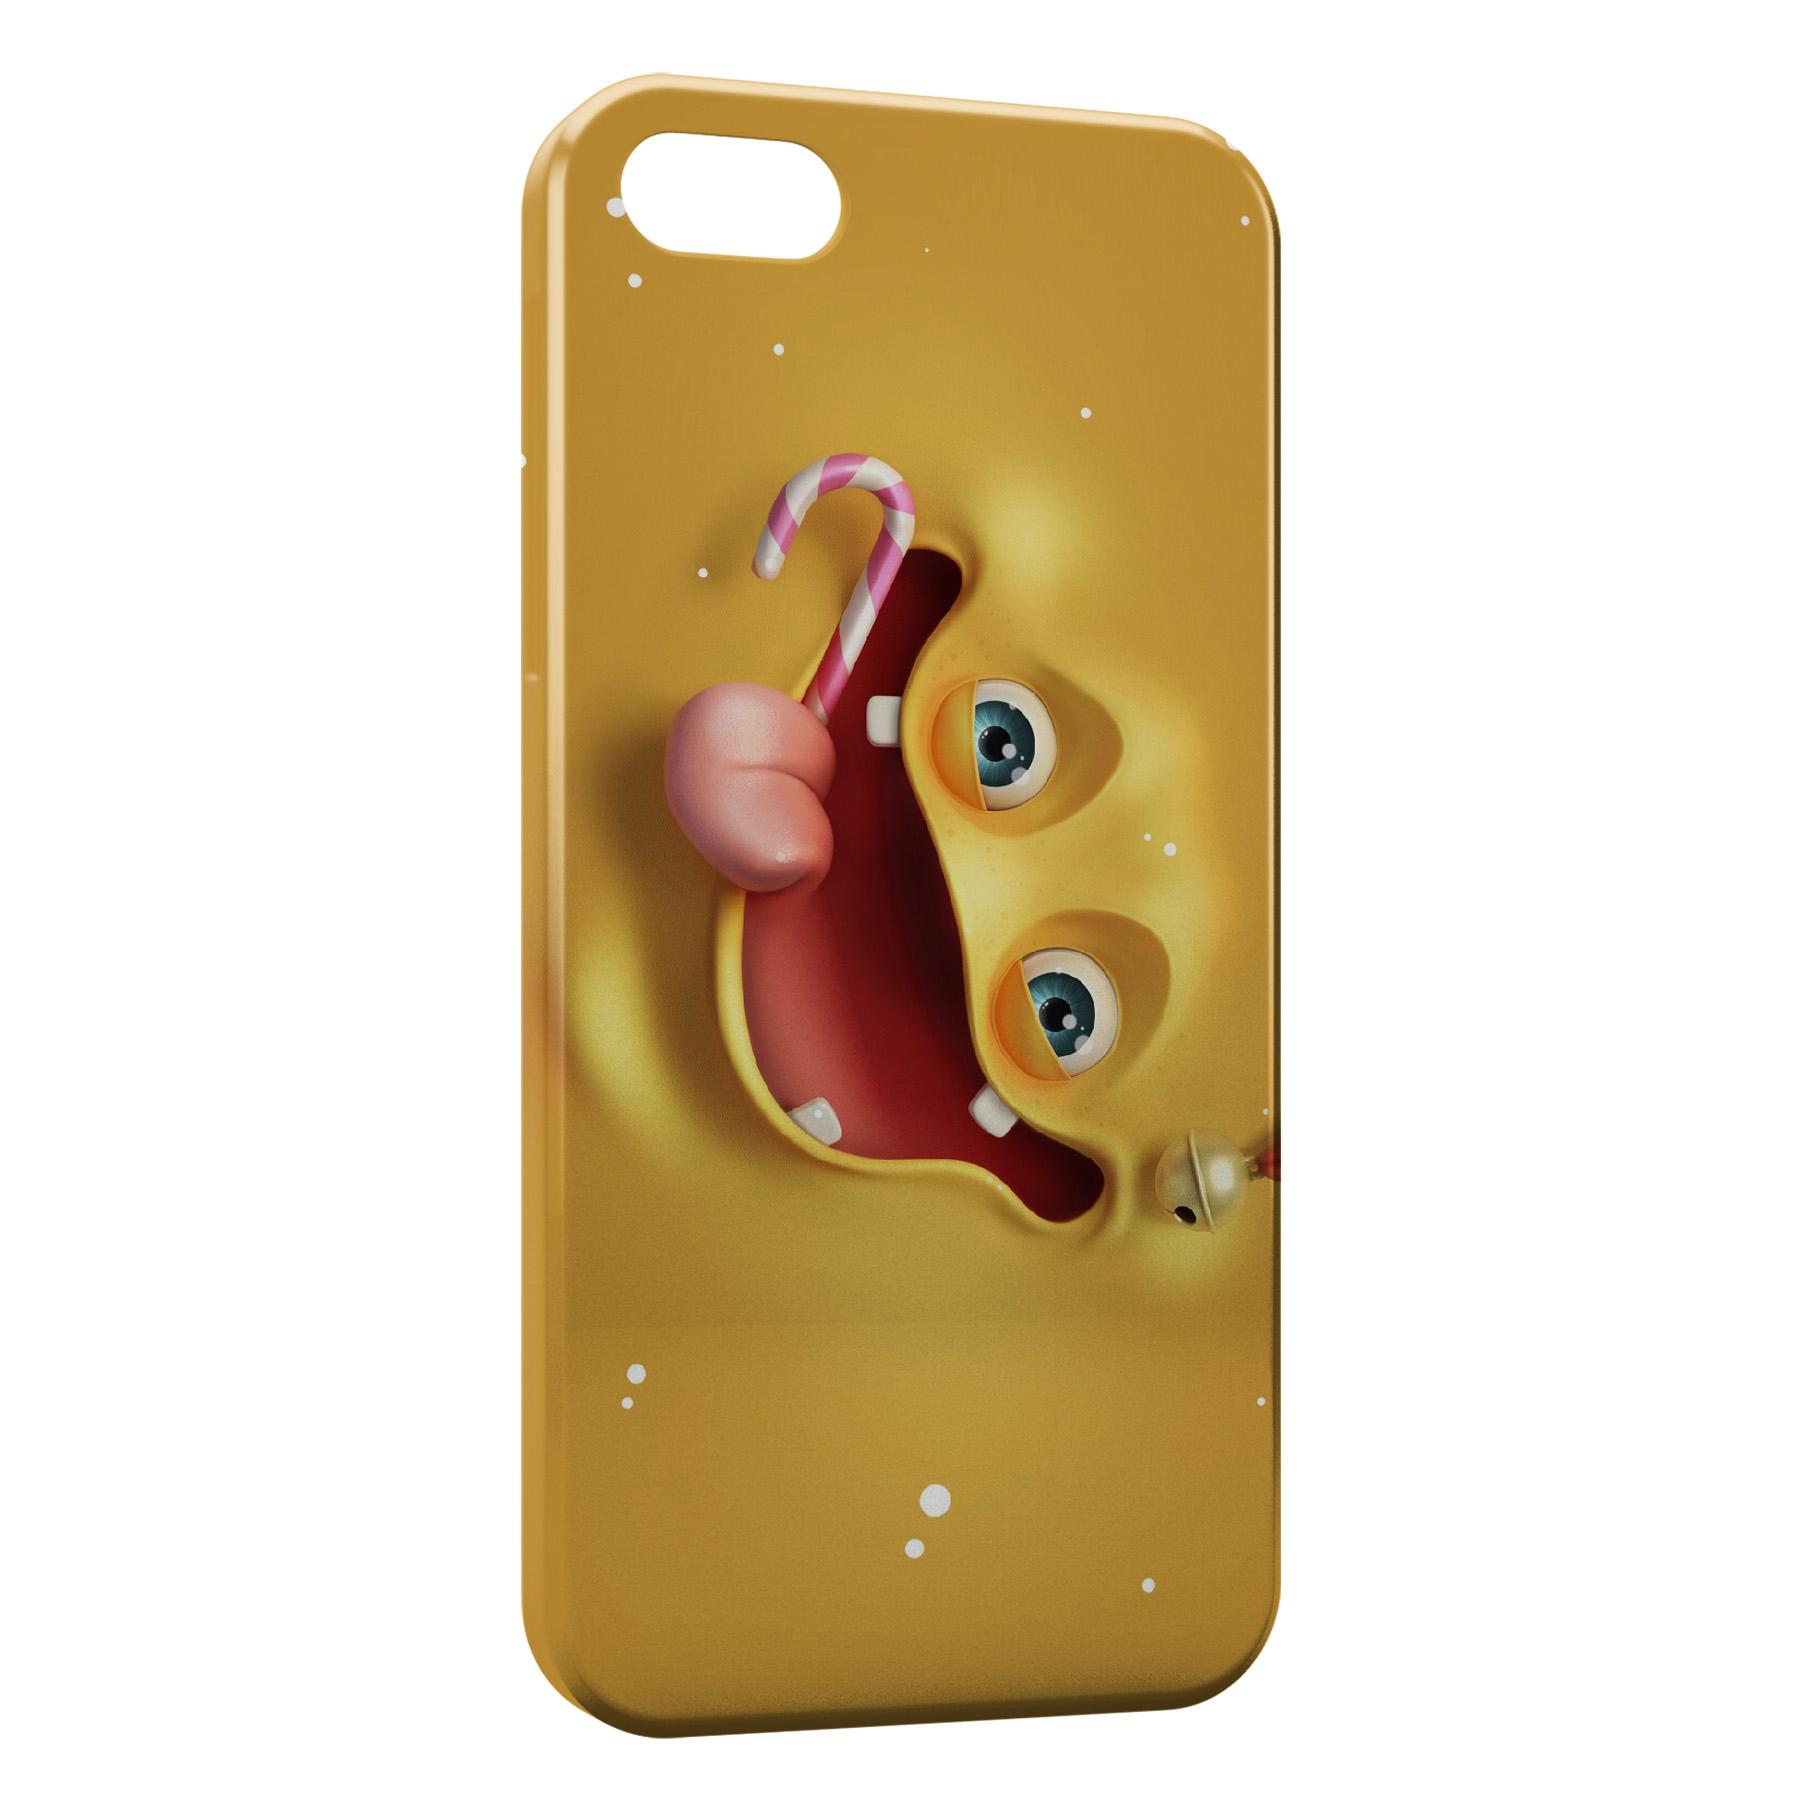 coque funny iphone 7